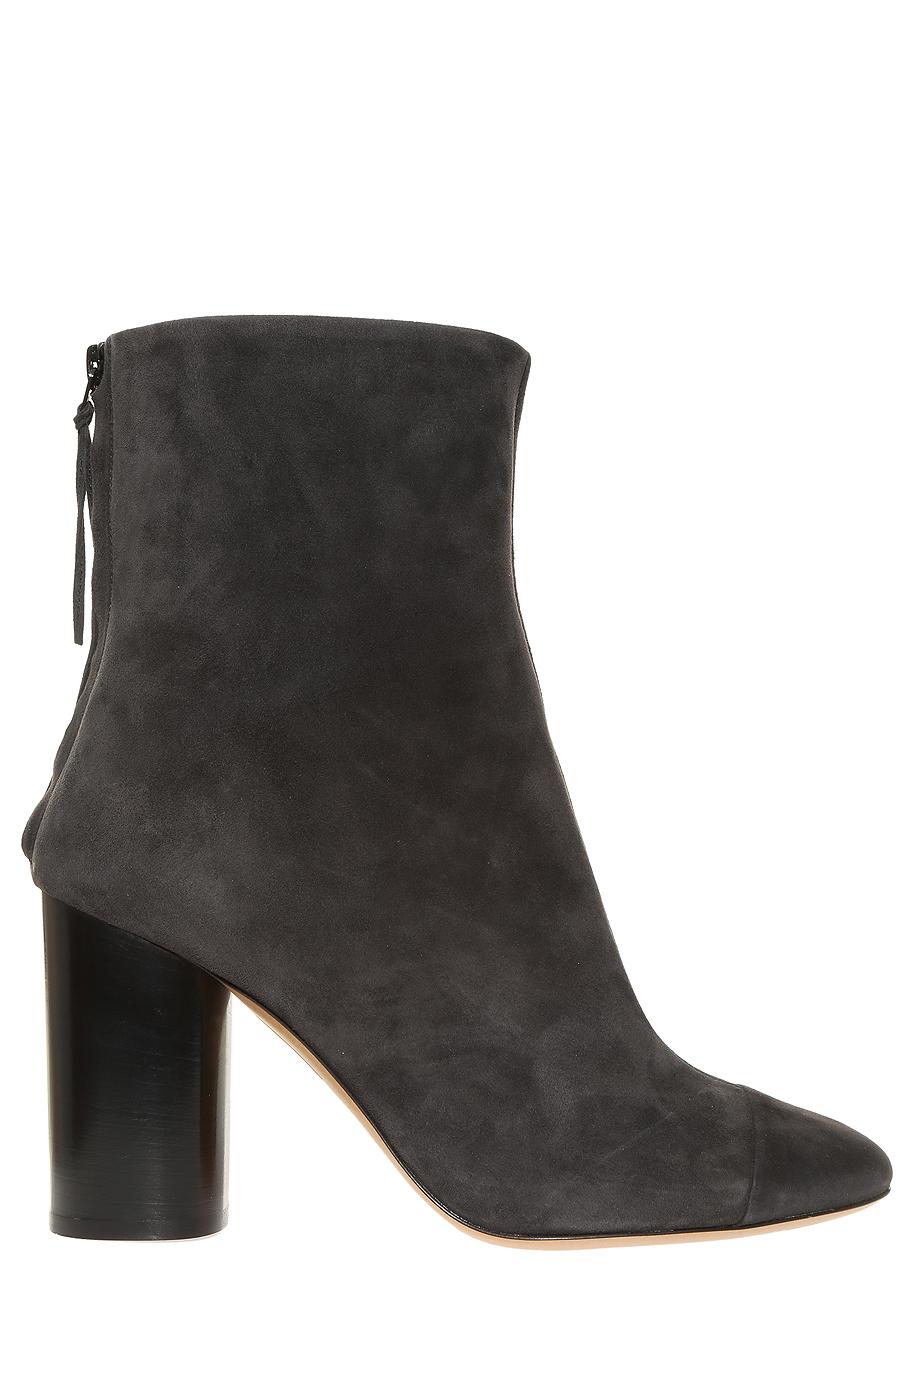 isabel marant grover suede ankle boots in black lyst. Black Bedroom Furniture Sets. Home Design Ideas